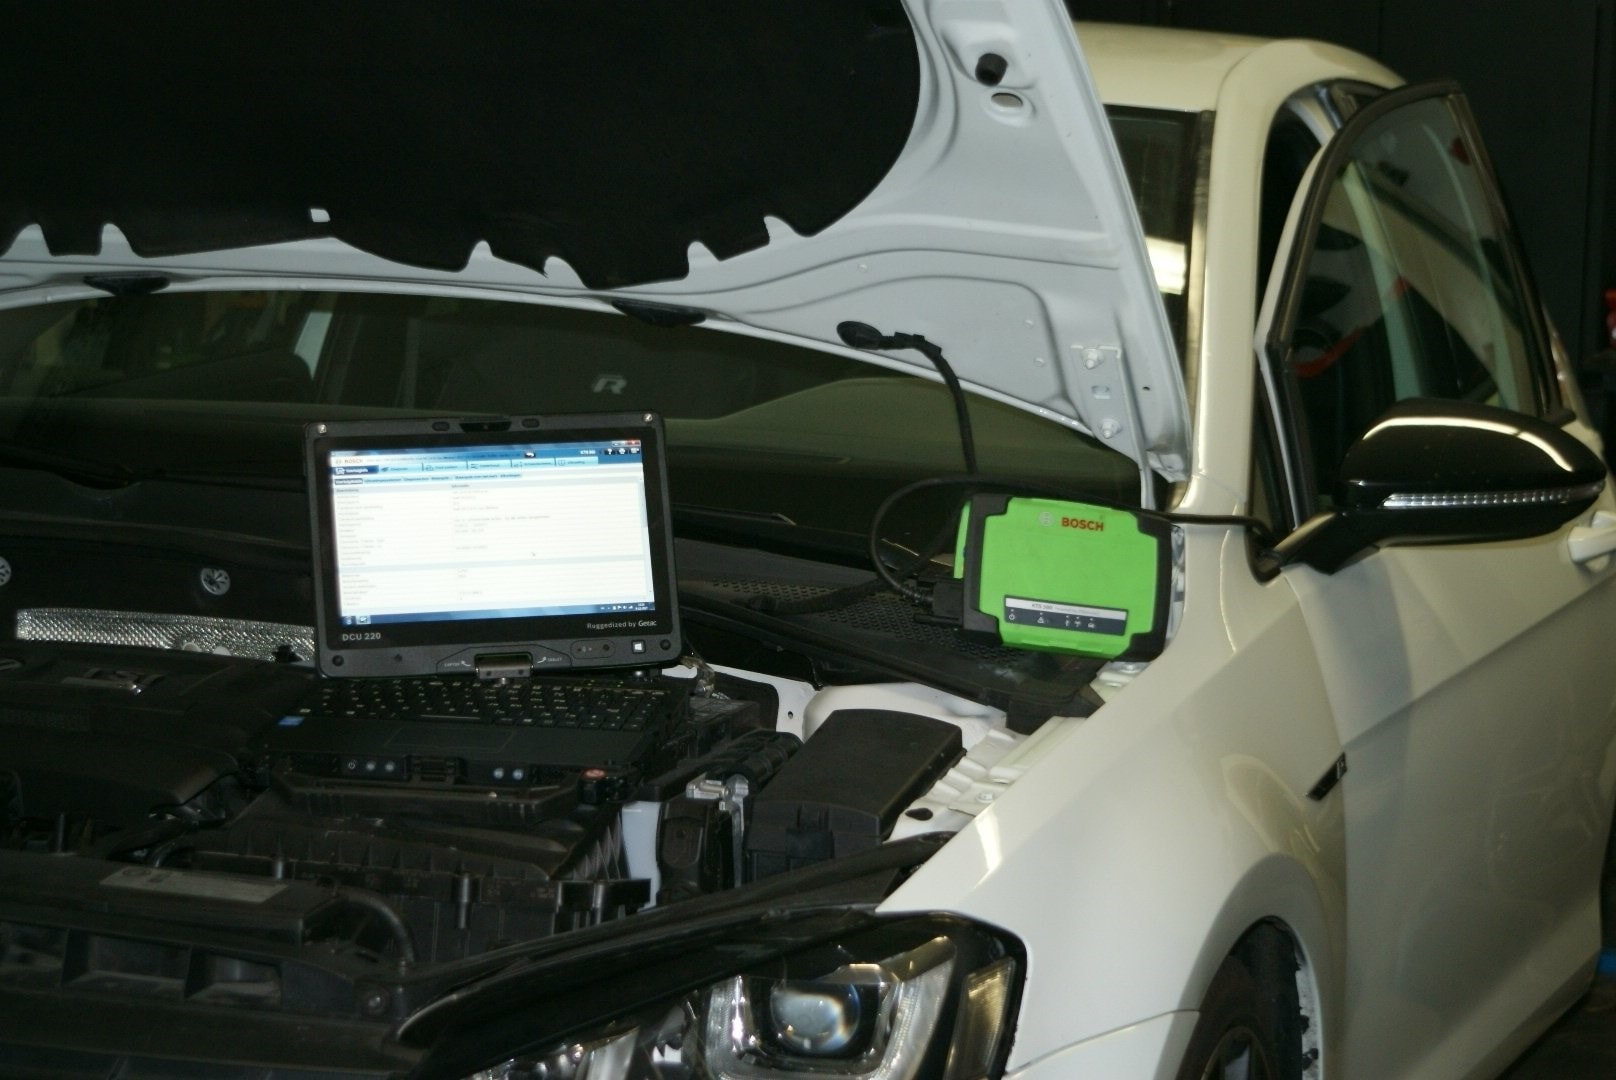 Professionele diagnose met Bosch apparatuur, voor ieder merk. Quality Car Service Waalre, omgeving Eindhoven